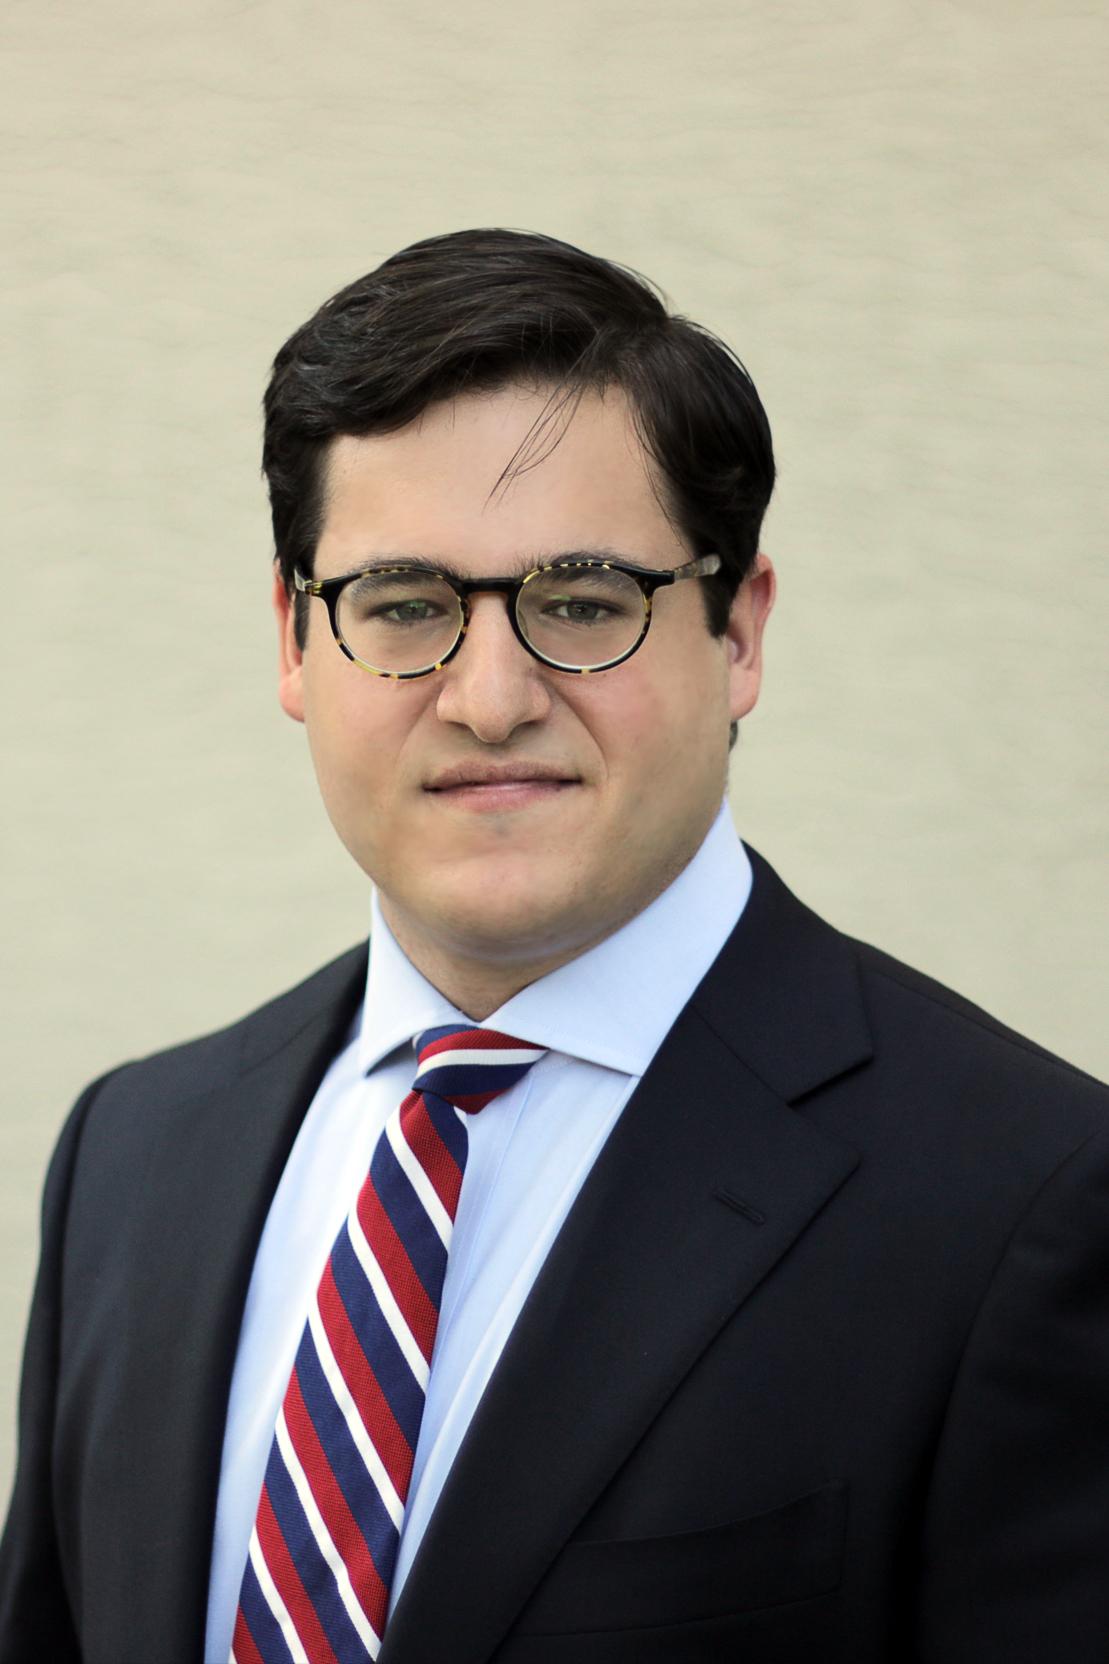 Frank Mangiaracina - Personal Injury Lawyer